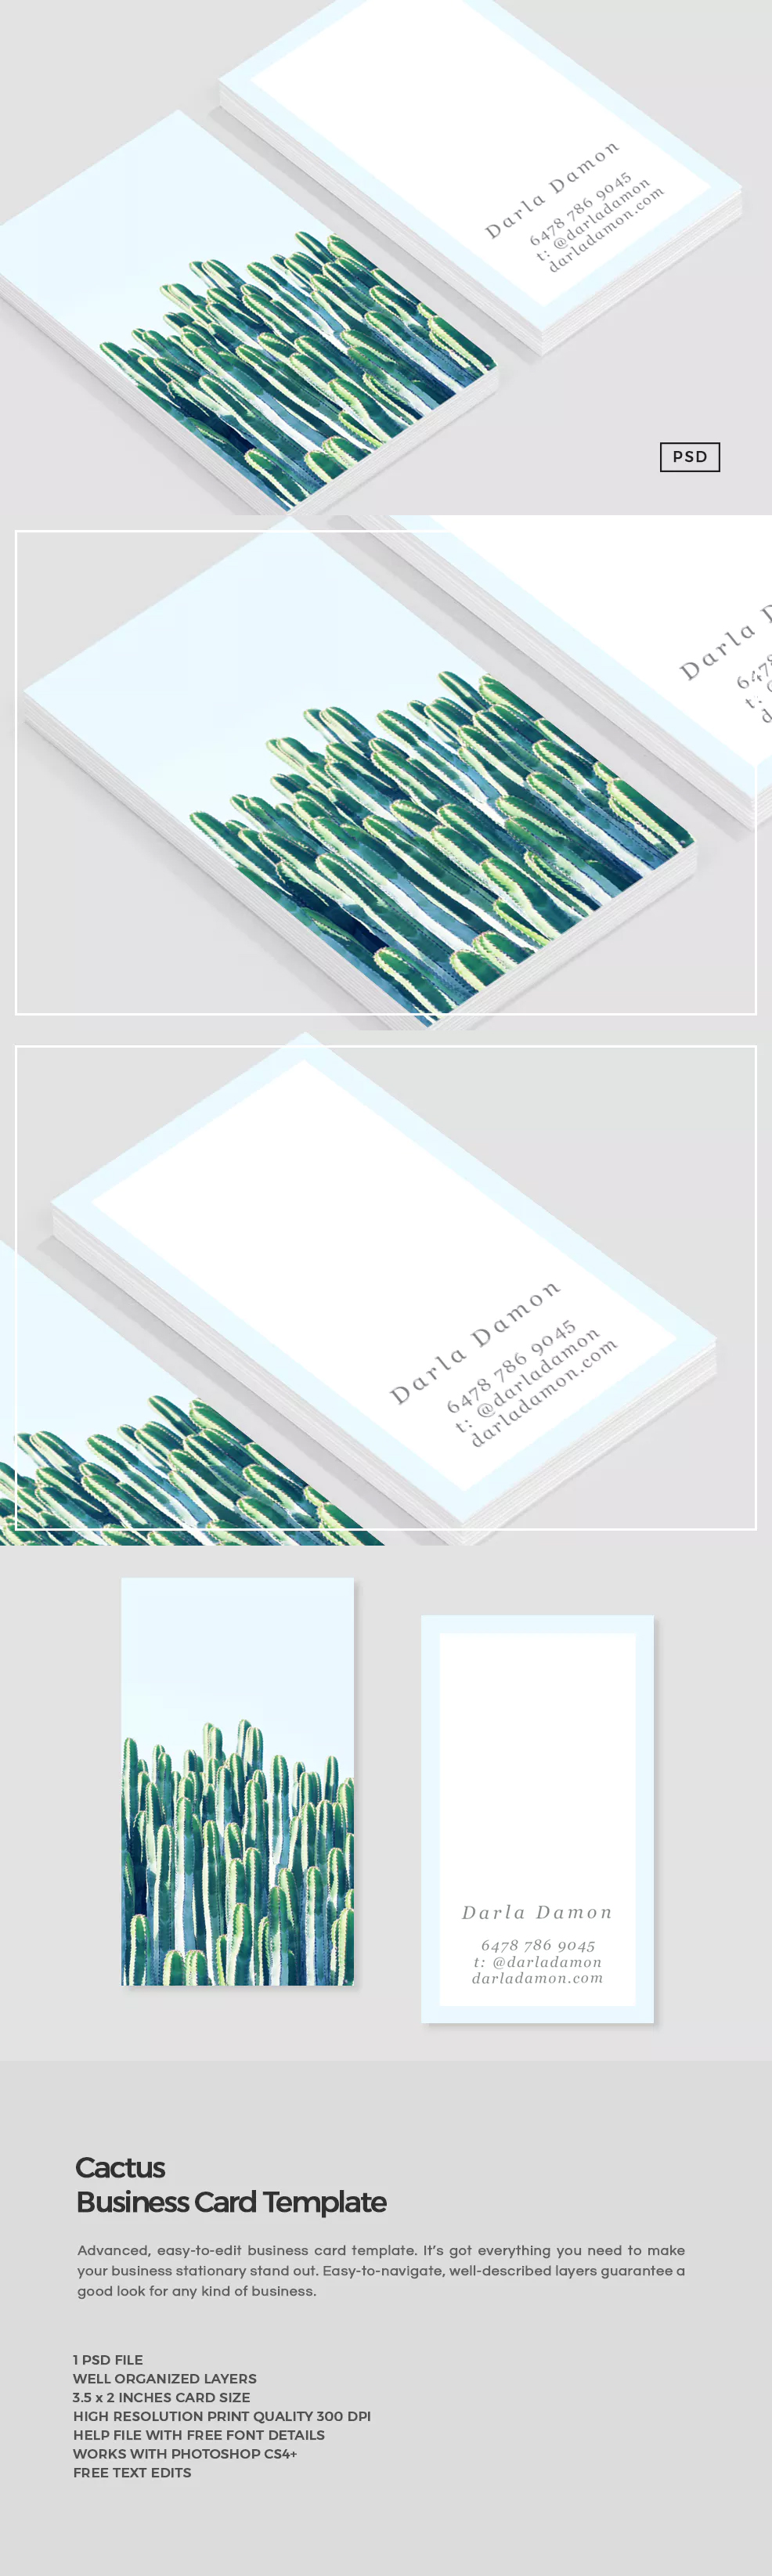 Cactus Business Card Template PSD | Business Card Inspiration ...